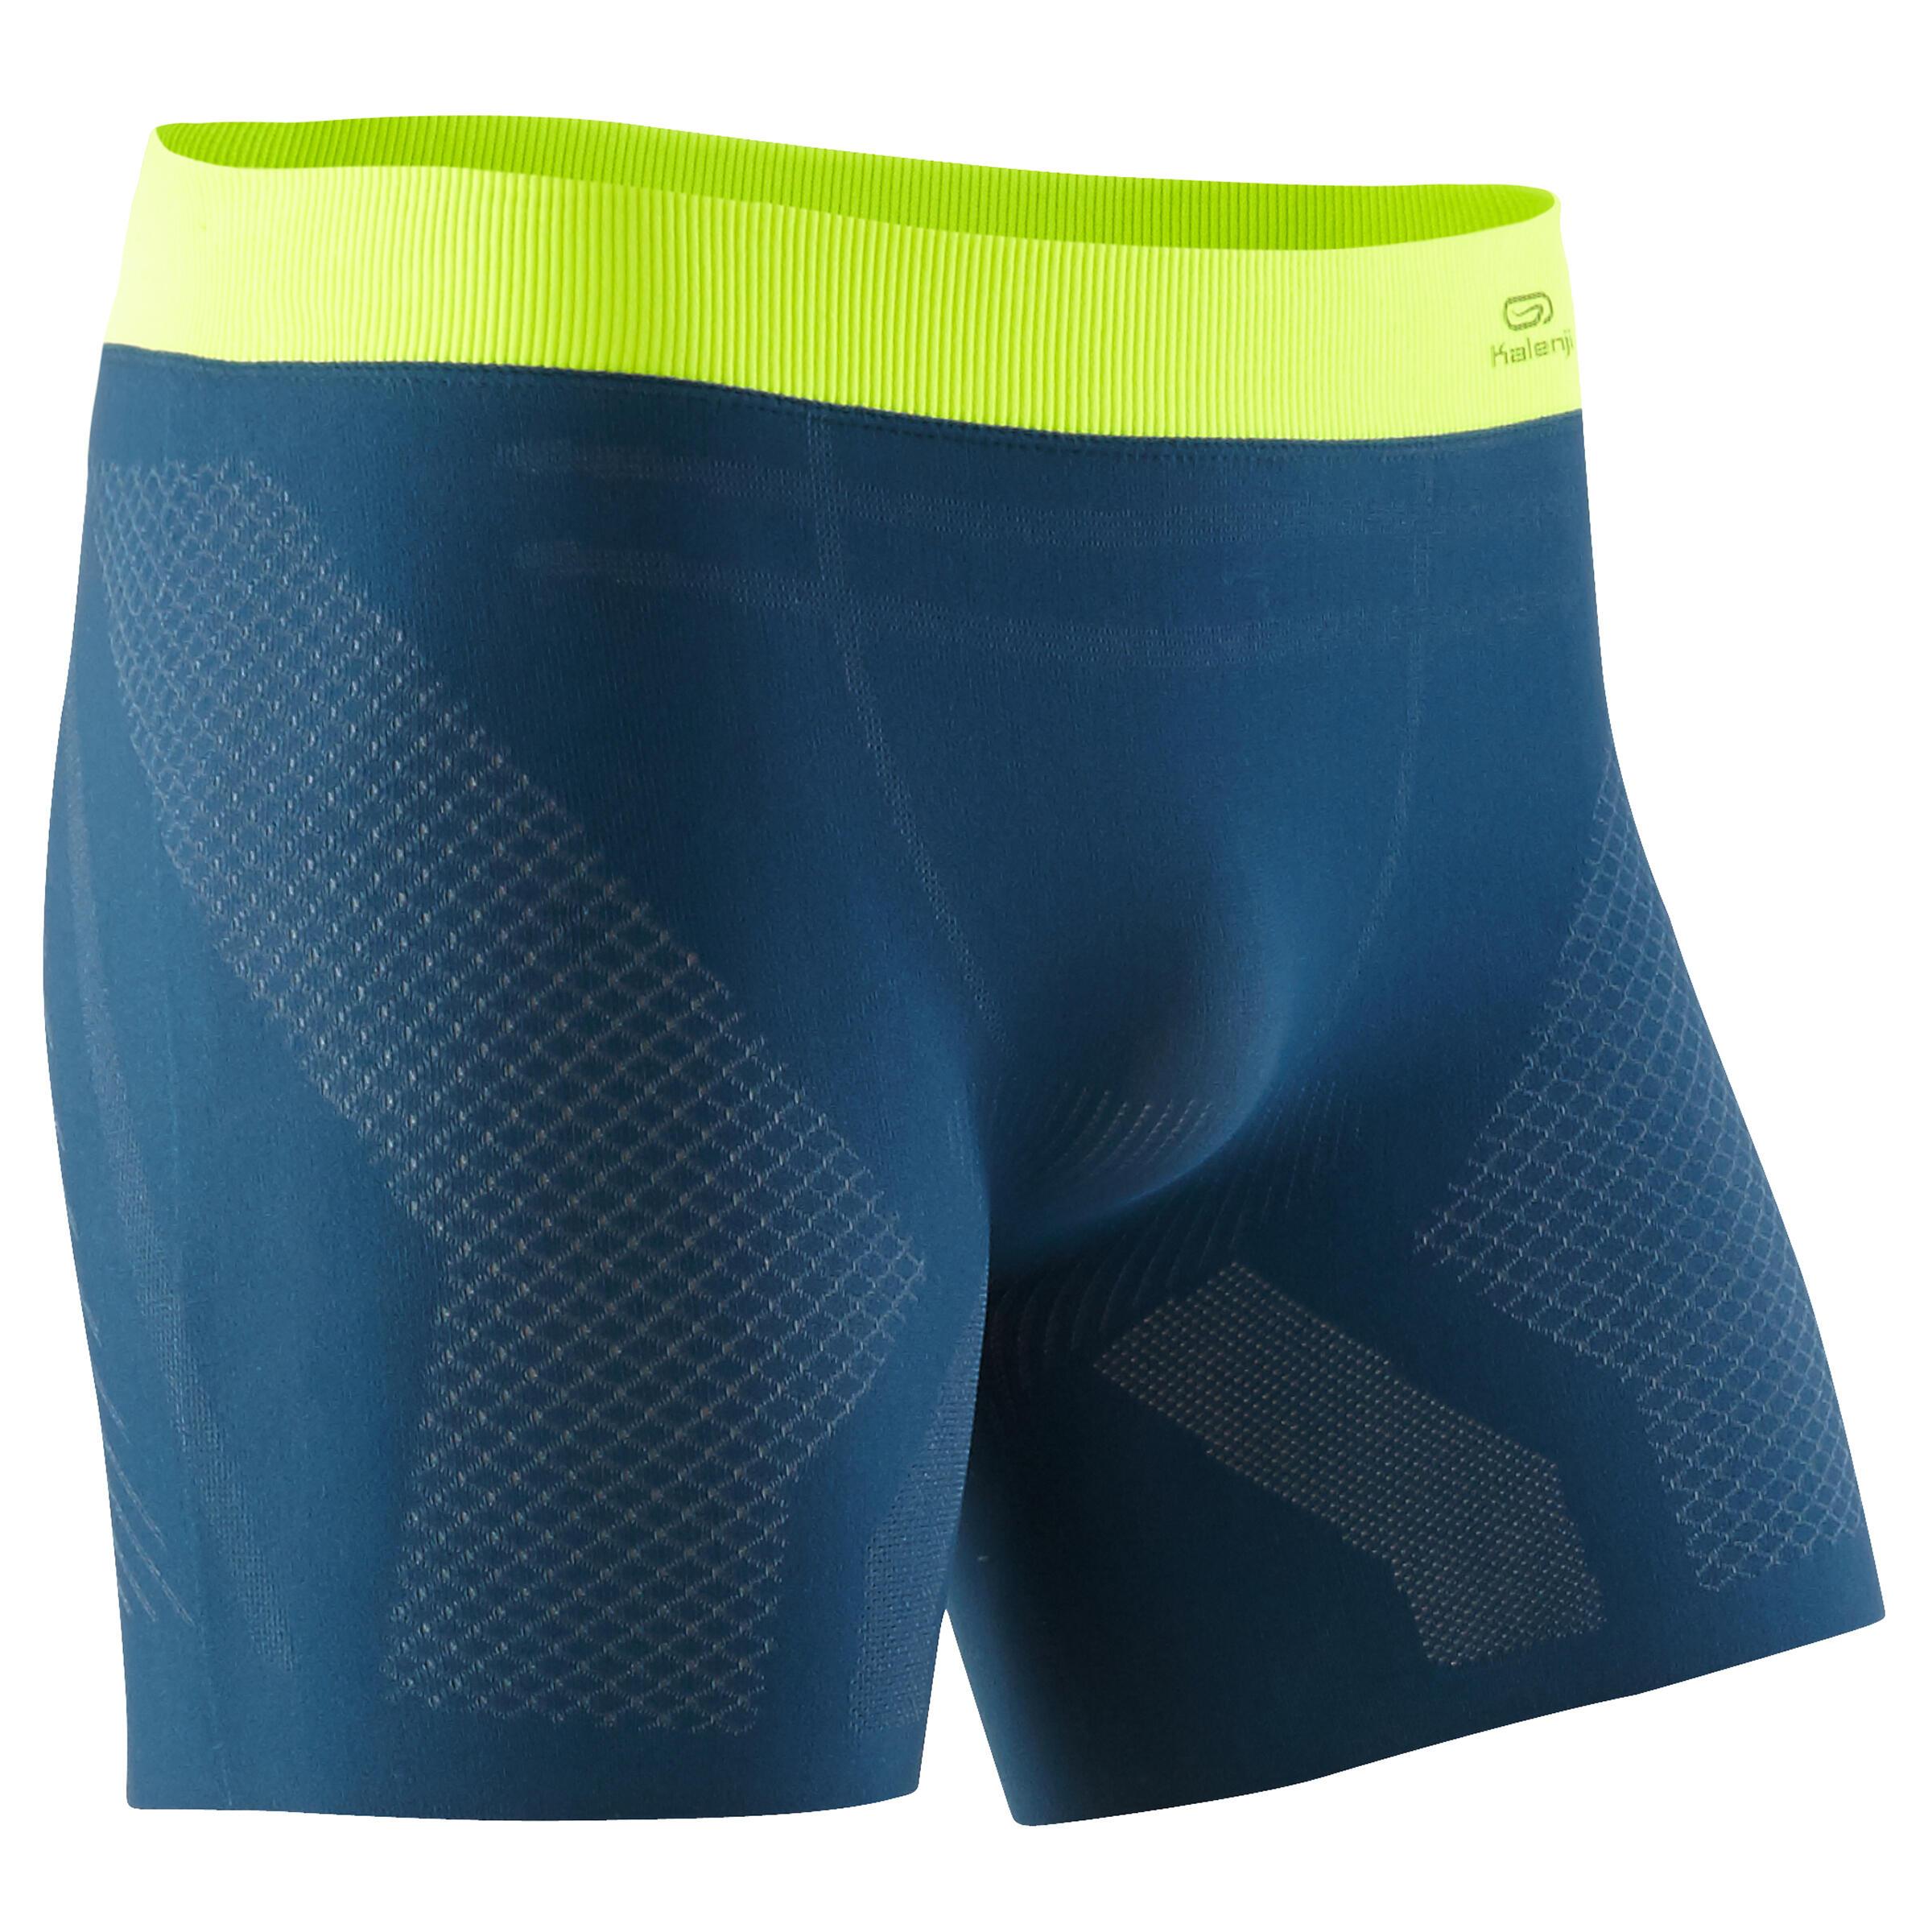 Funktionsunterhose Lauf-Boxershorts Herren blau | Sportbekleidung > Funktionswäsche > Thermoleggings | Blau - Gelb | Kalenji